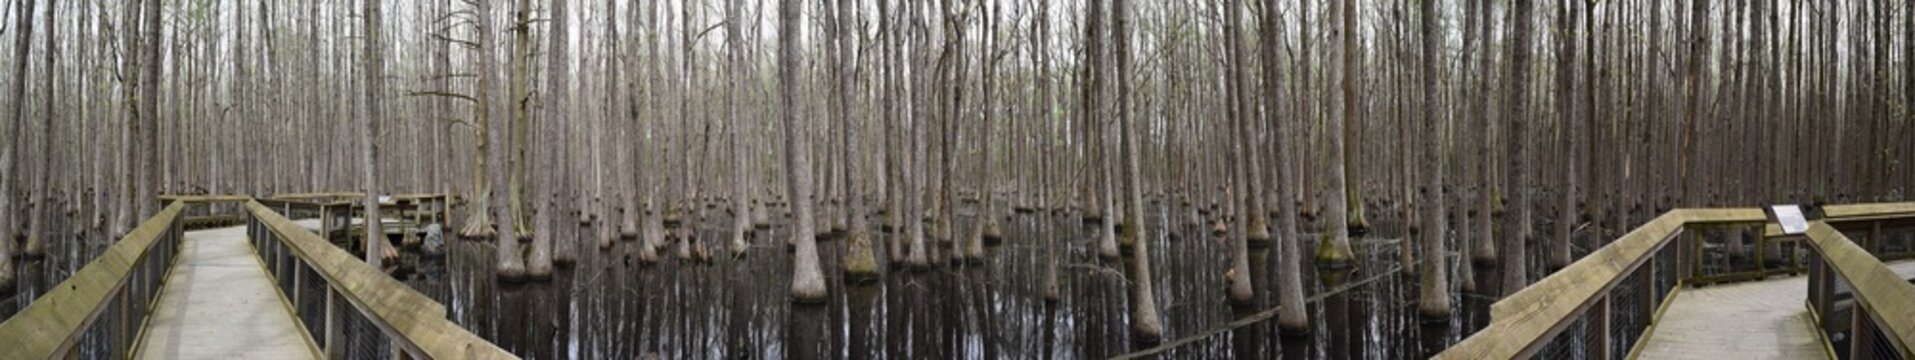 Swamp in Louisiana Purchase State Park, Arkansas